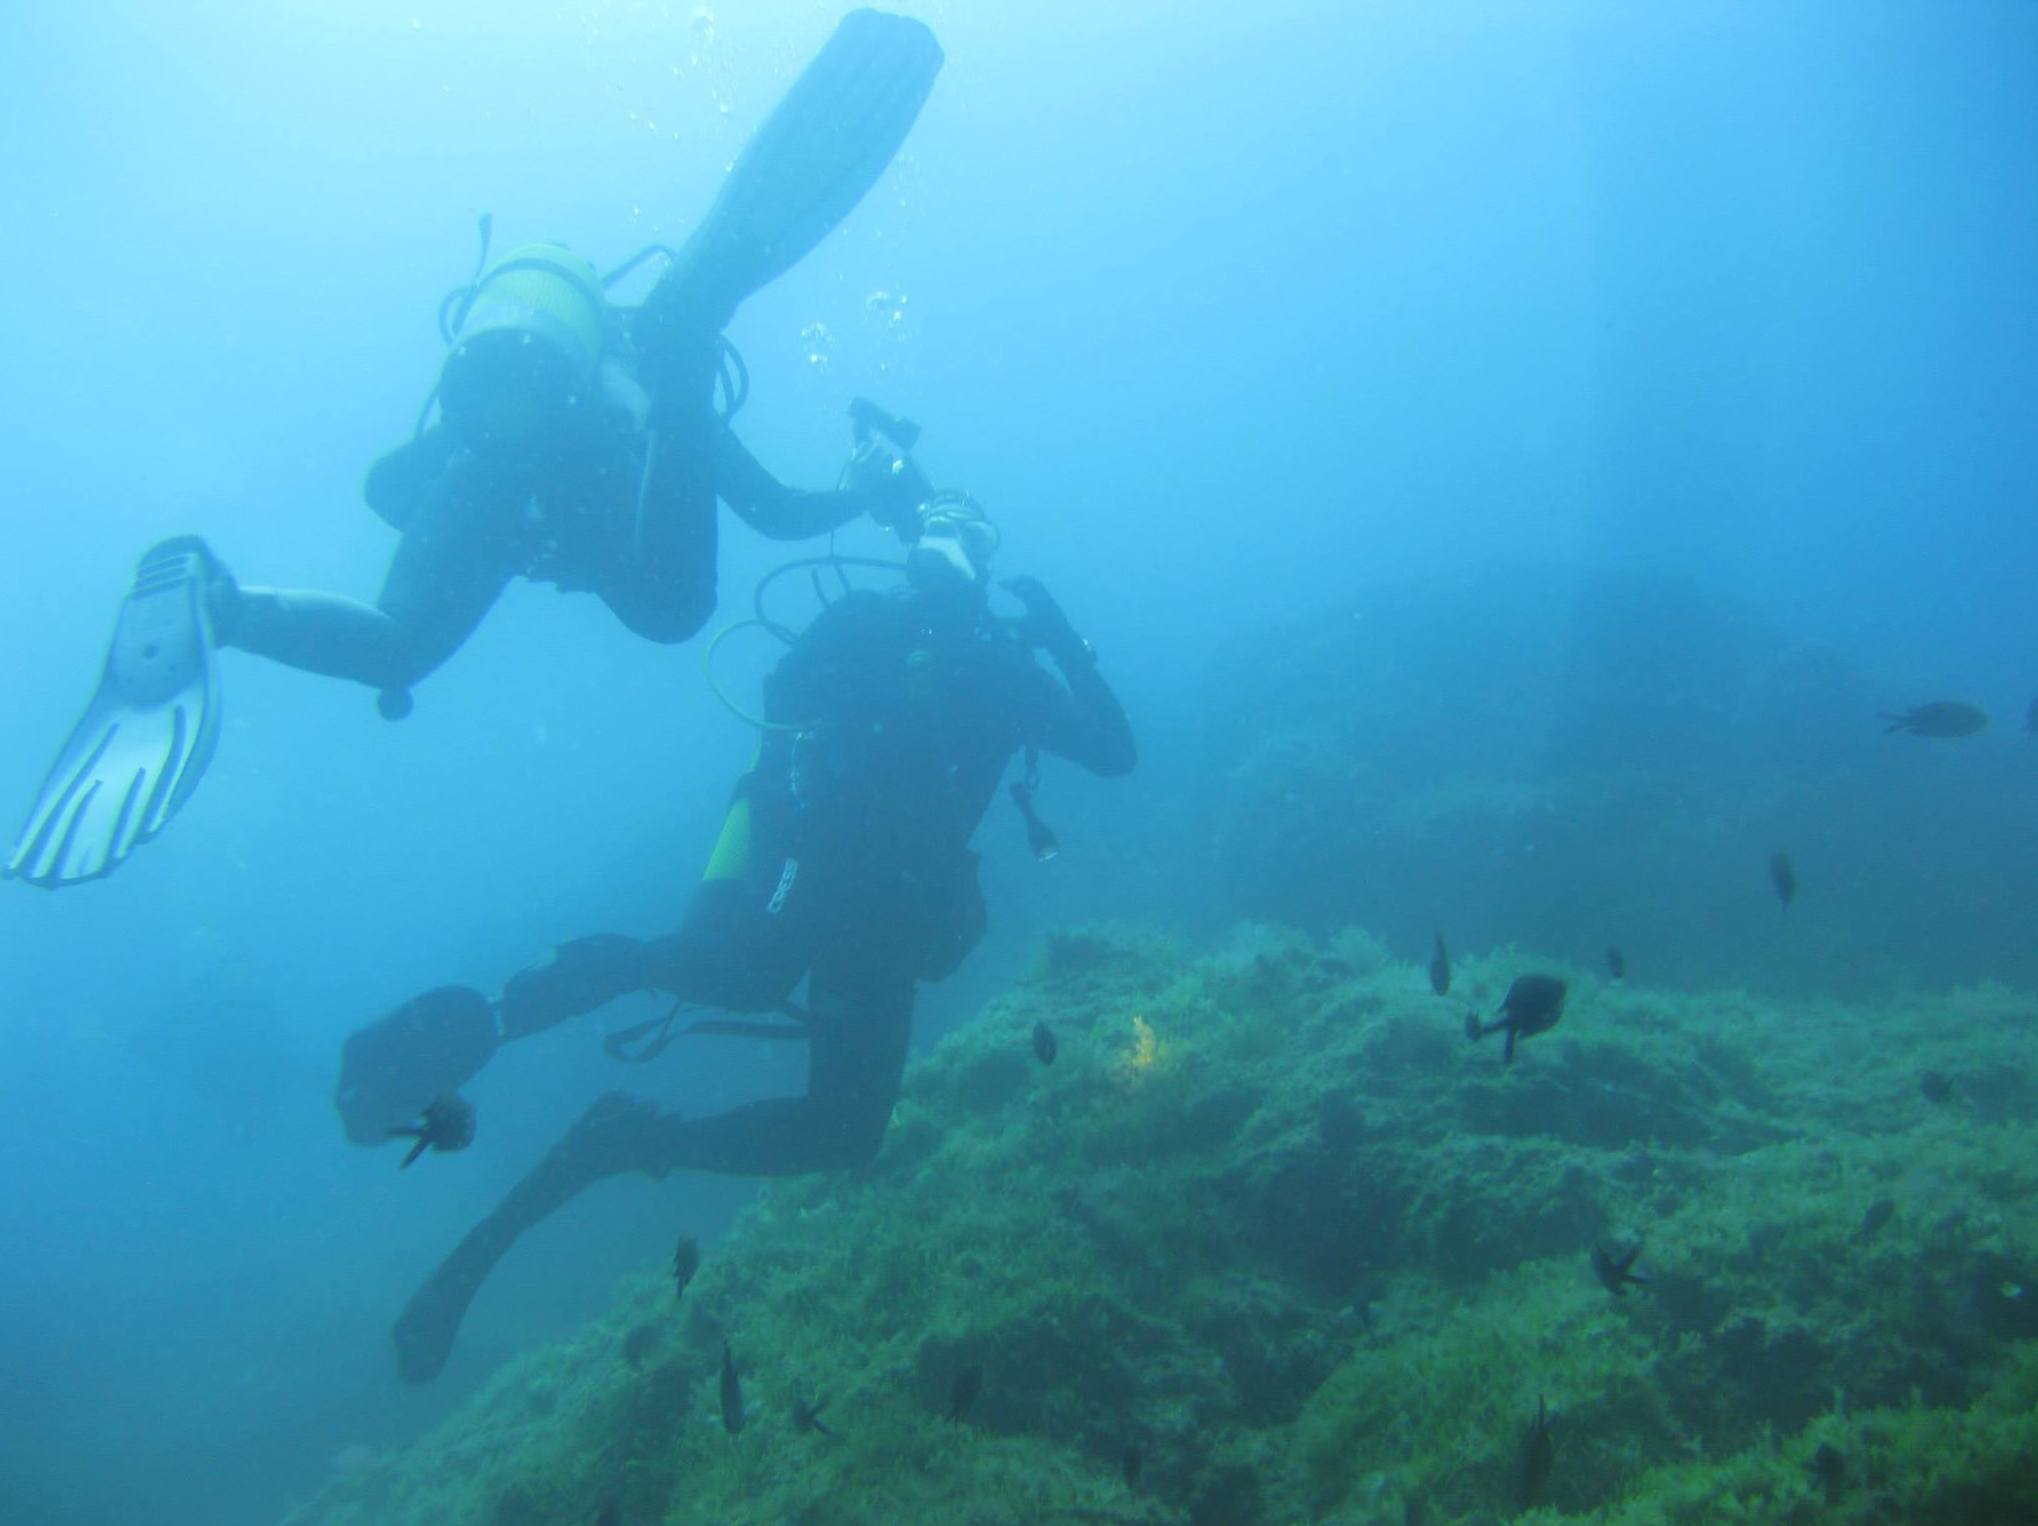 Paseo por las profundidades marinas